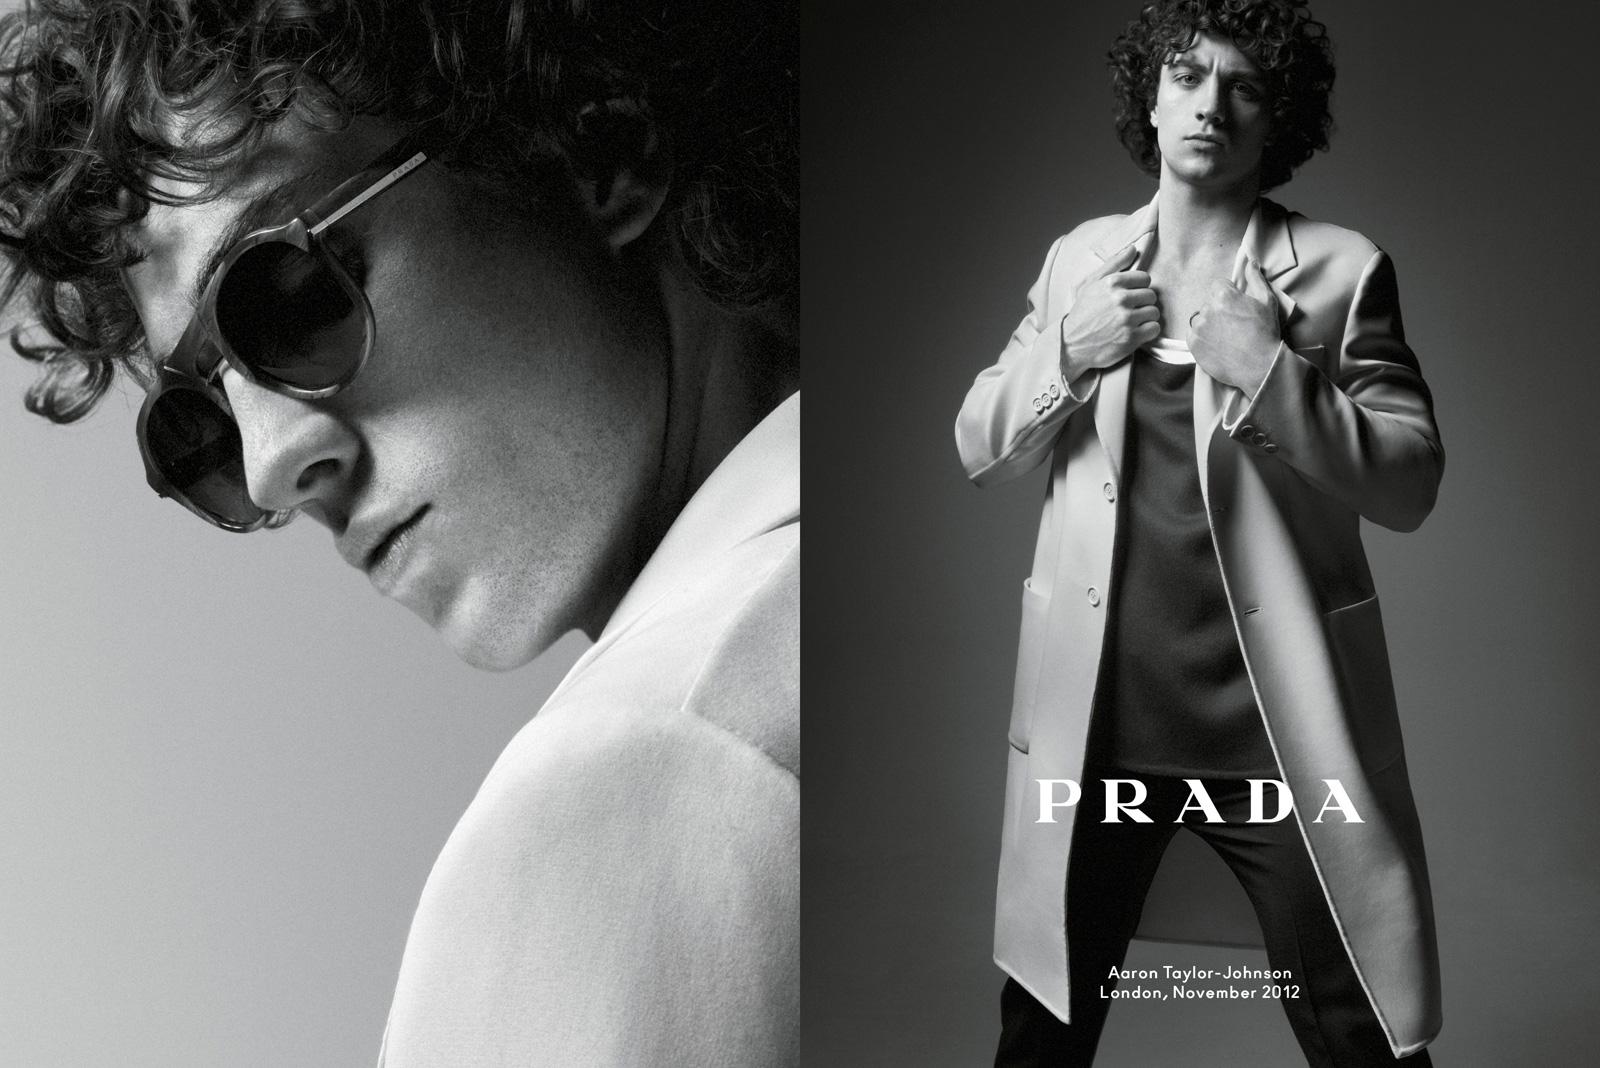 2ac1ad3ce86 Prada Spring Summer 2013 Ad Campaign